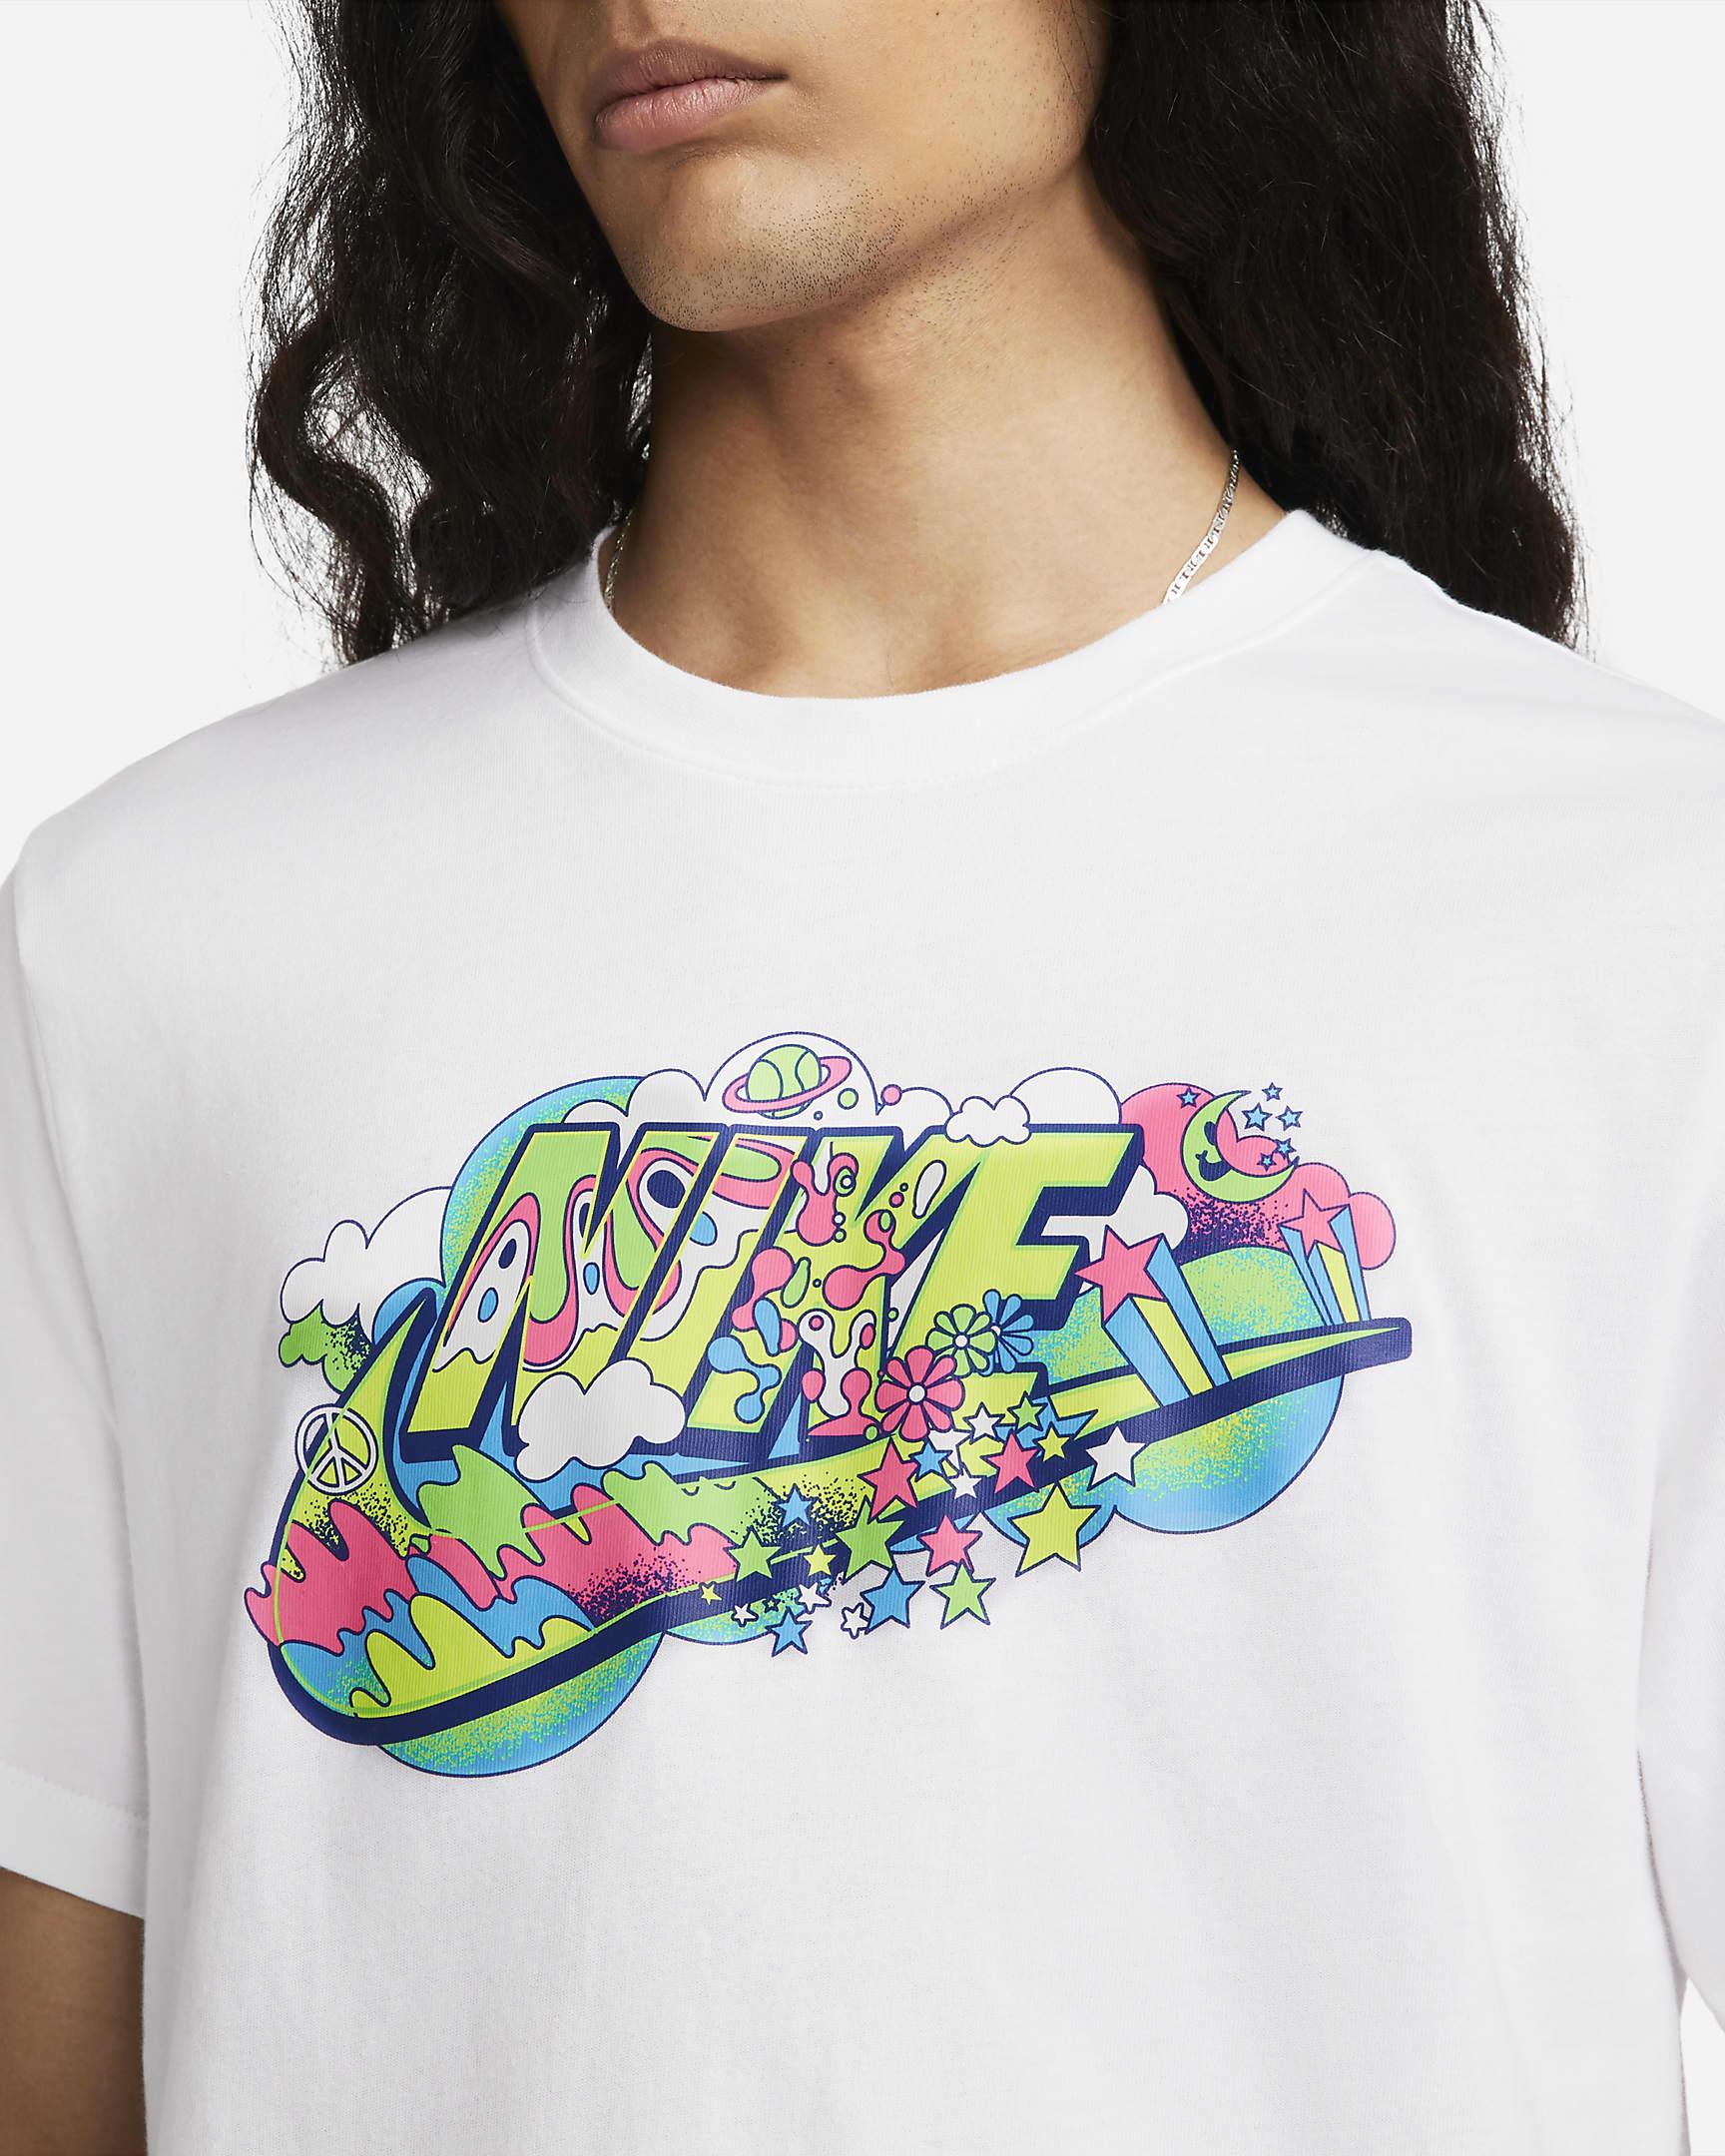 nike-sportswear-mens-black-light-t-shirt-wNmkGJ-3.png